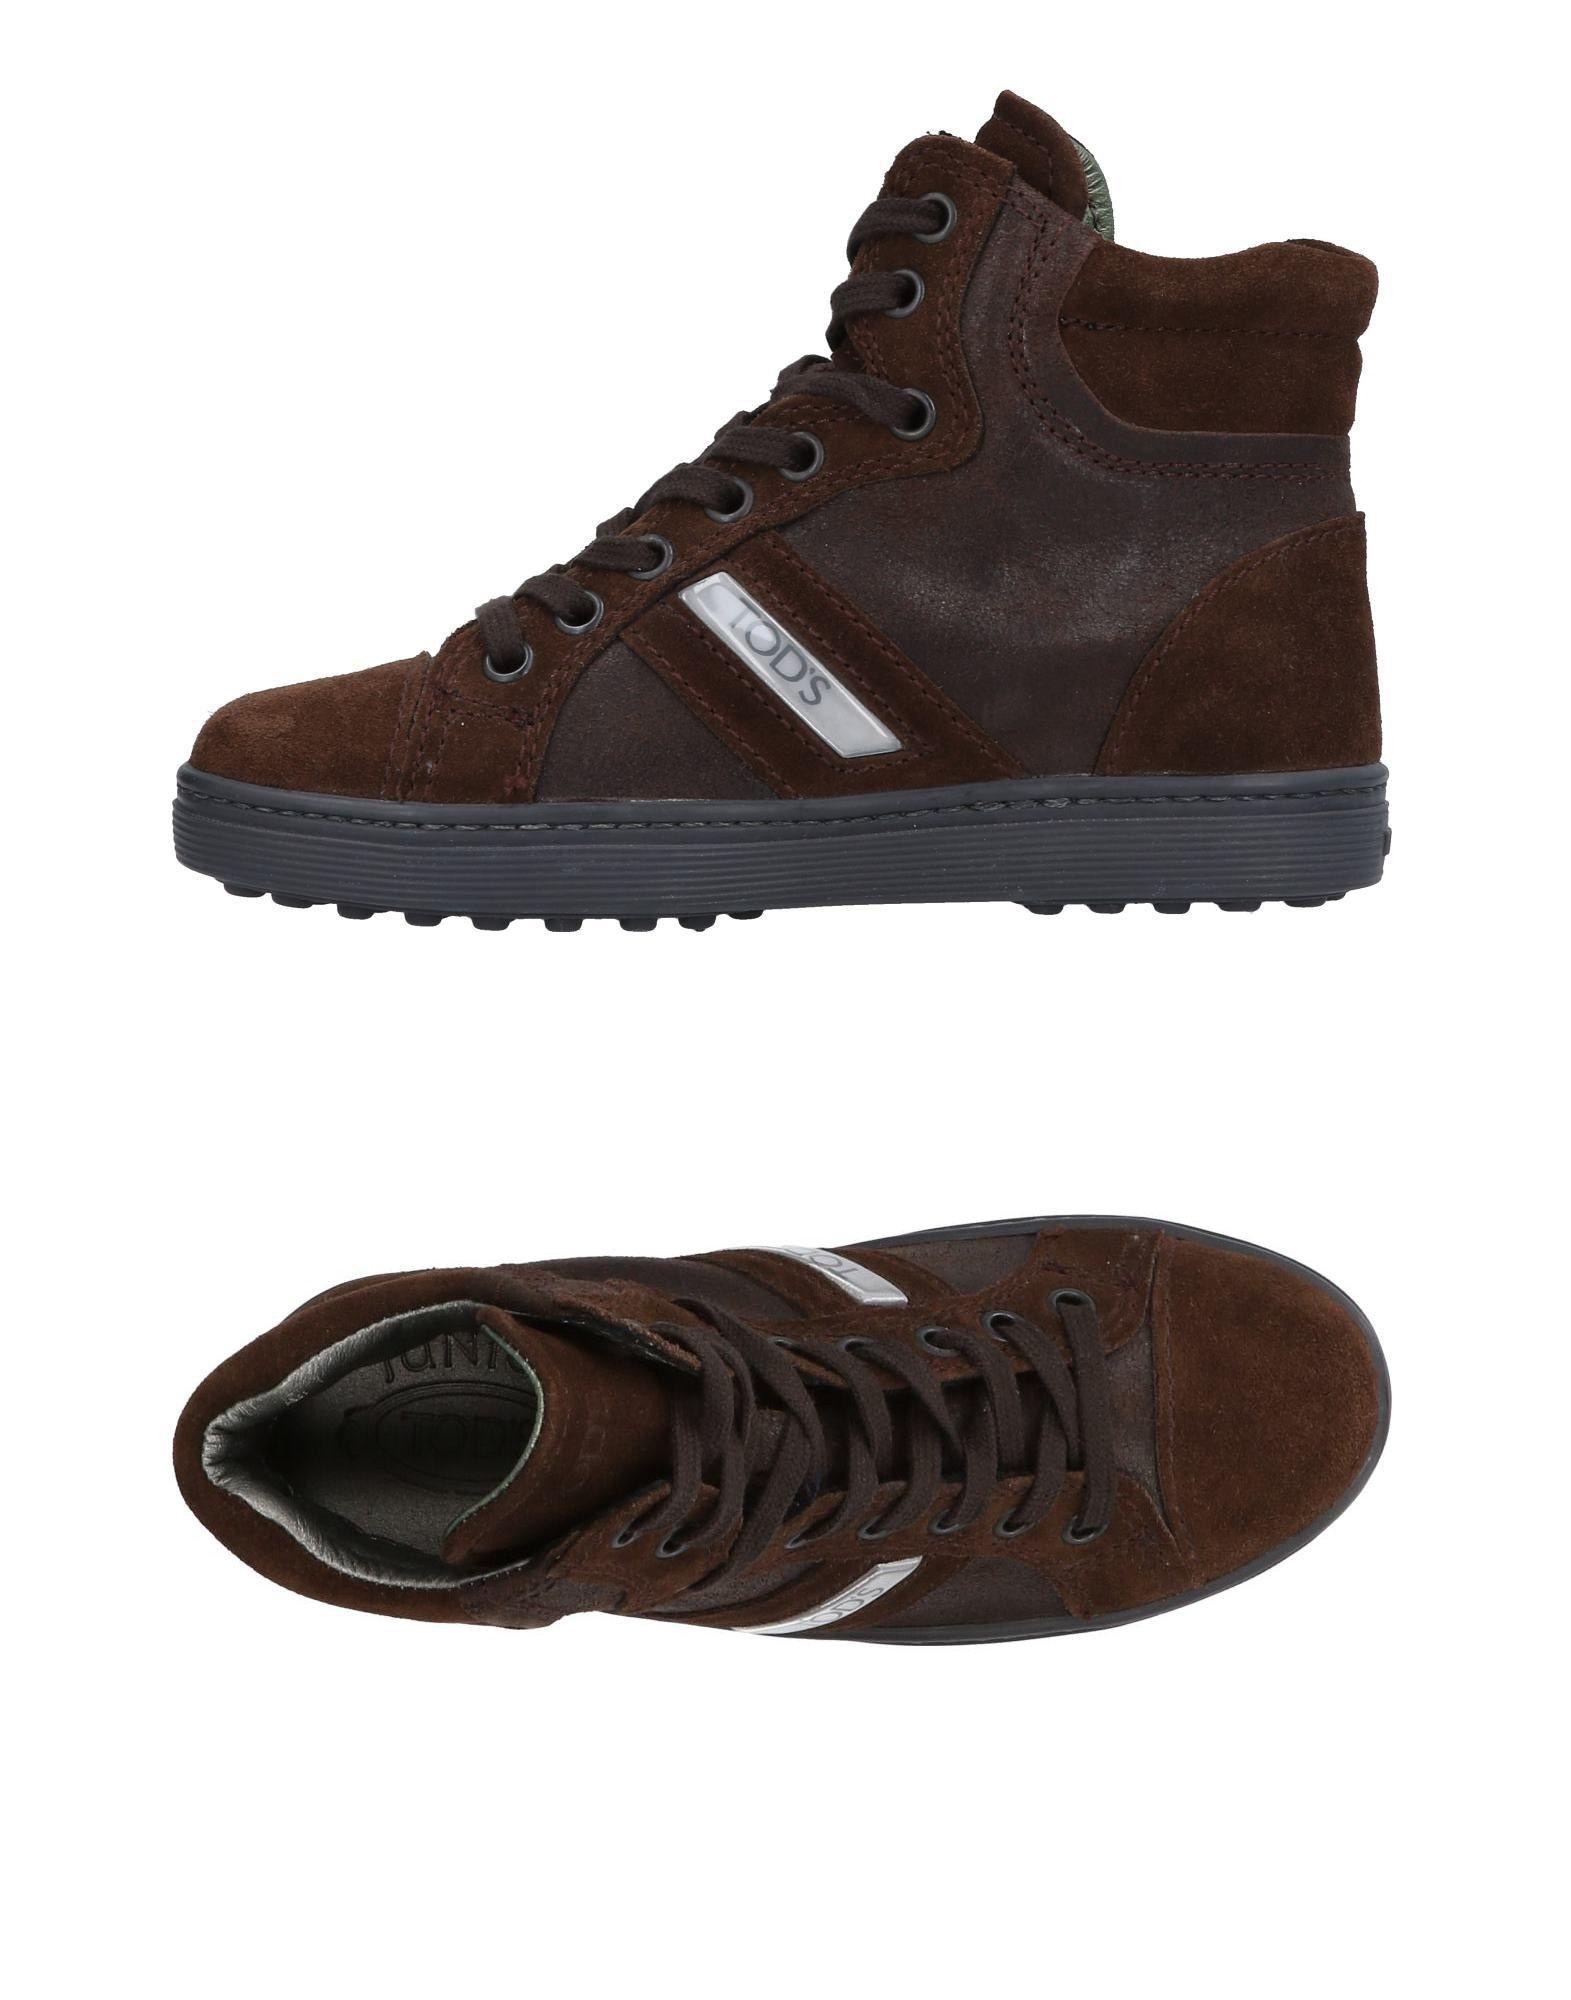 ea744c1ec62 TOD'S JUNIOR ΠΑΠΟΥΤΣΙΑ Χαμηλά sneakers, Παιδικά sneakers, ΠΑΙΔΙ ...